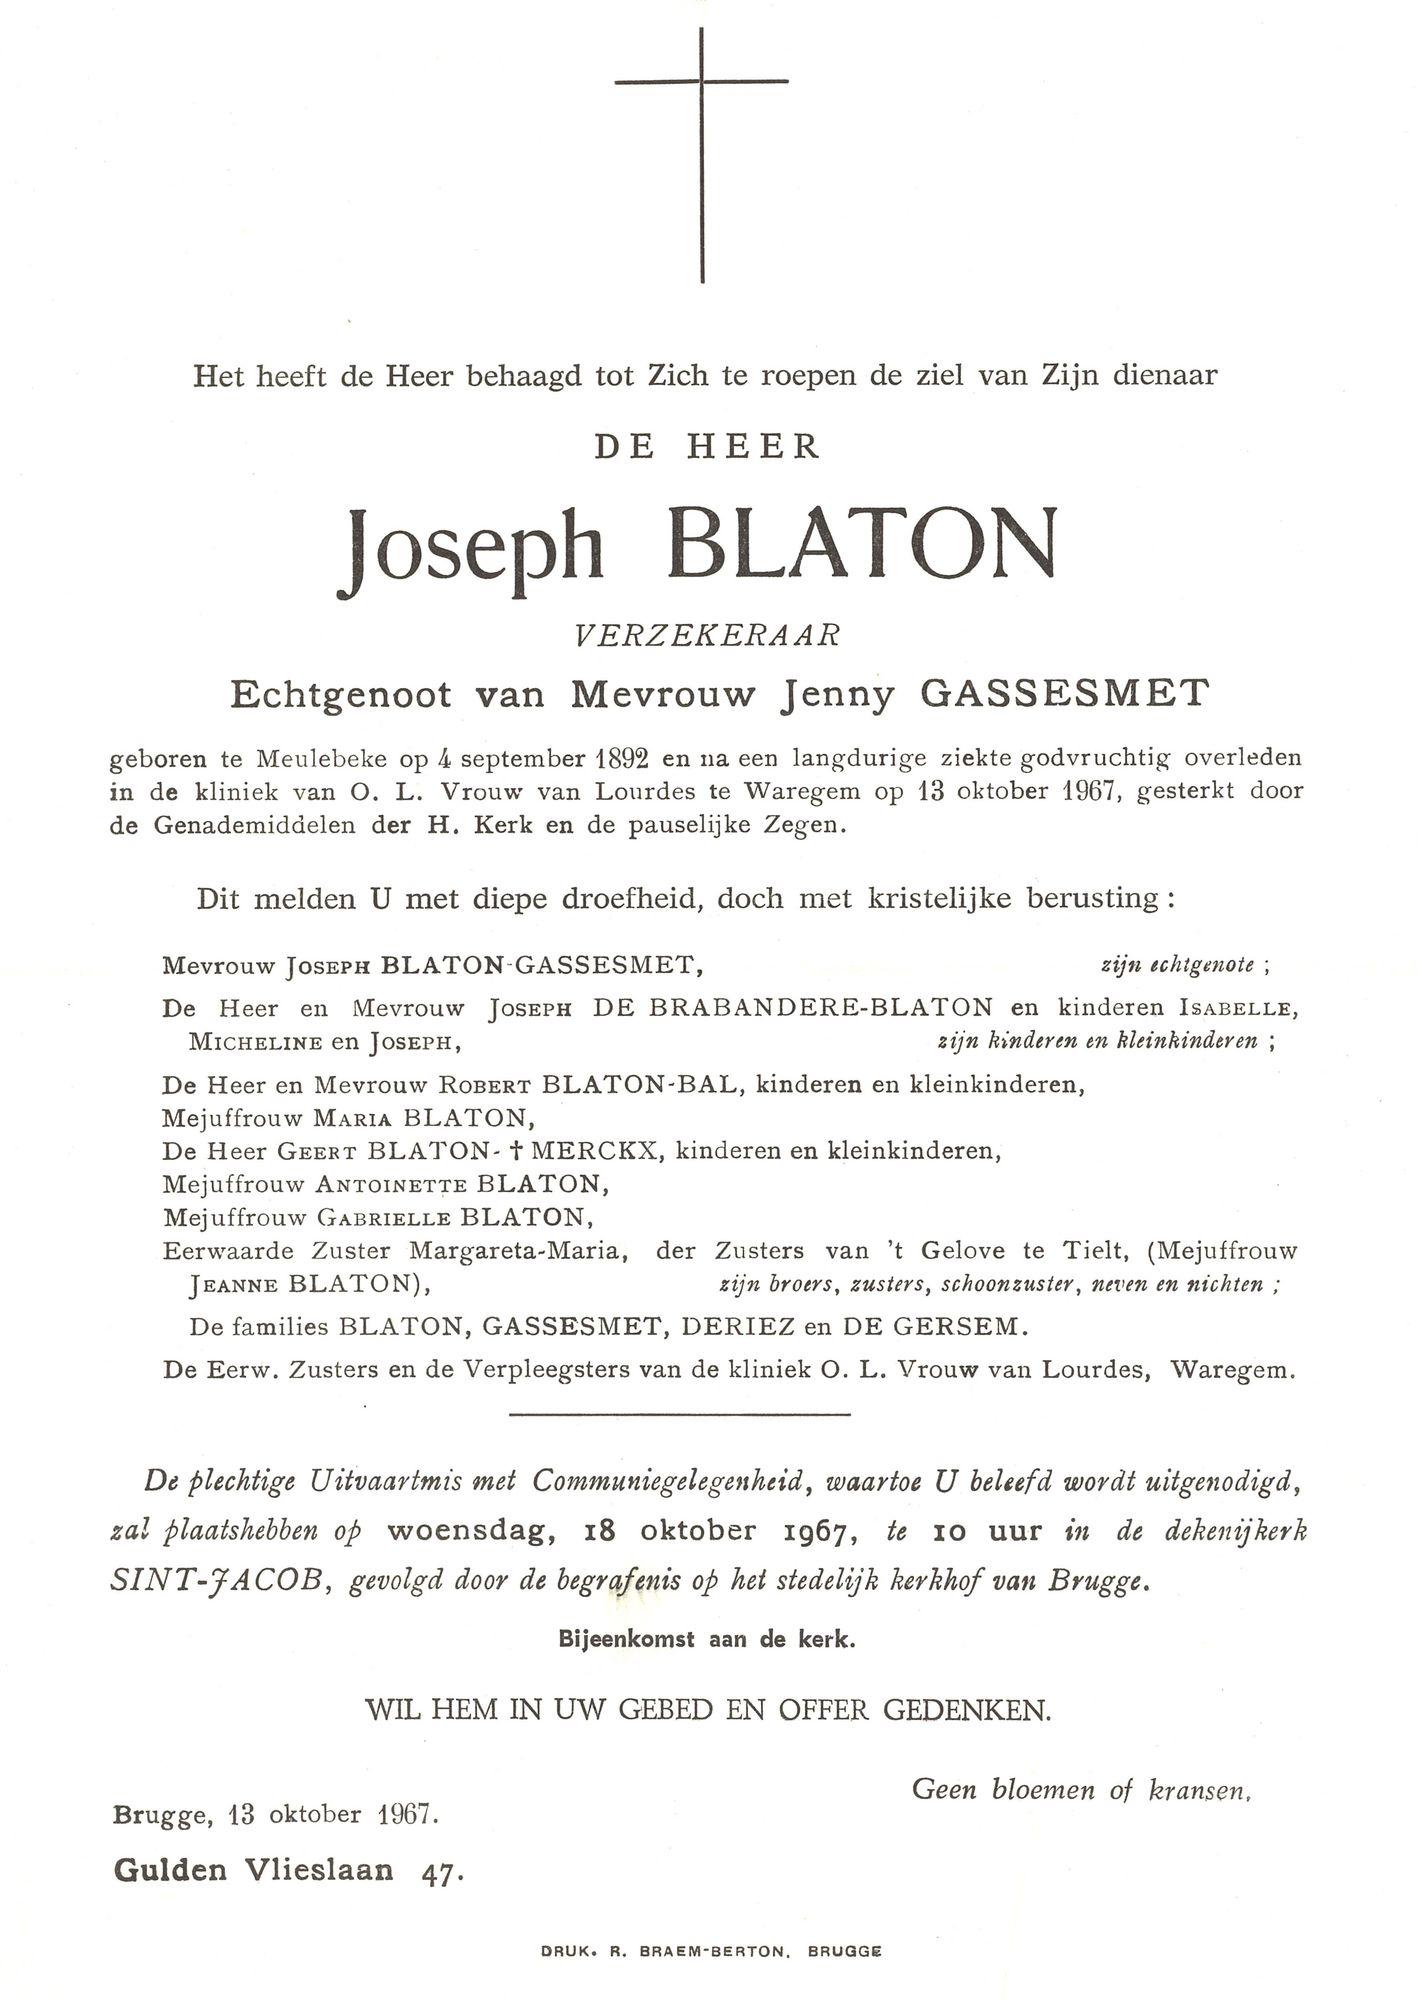 Joseph Blaton